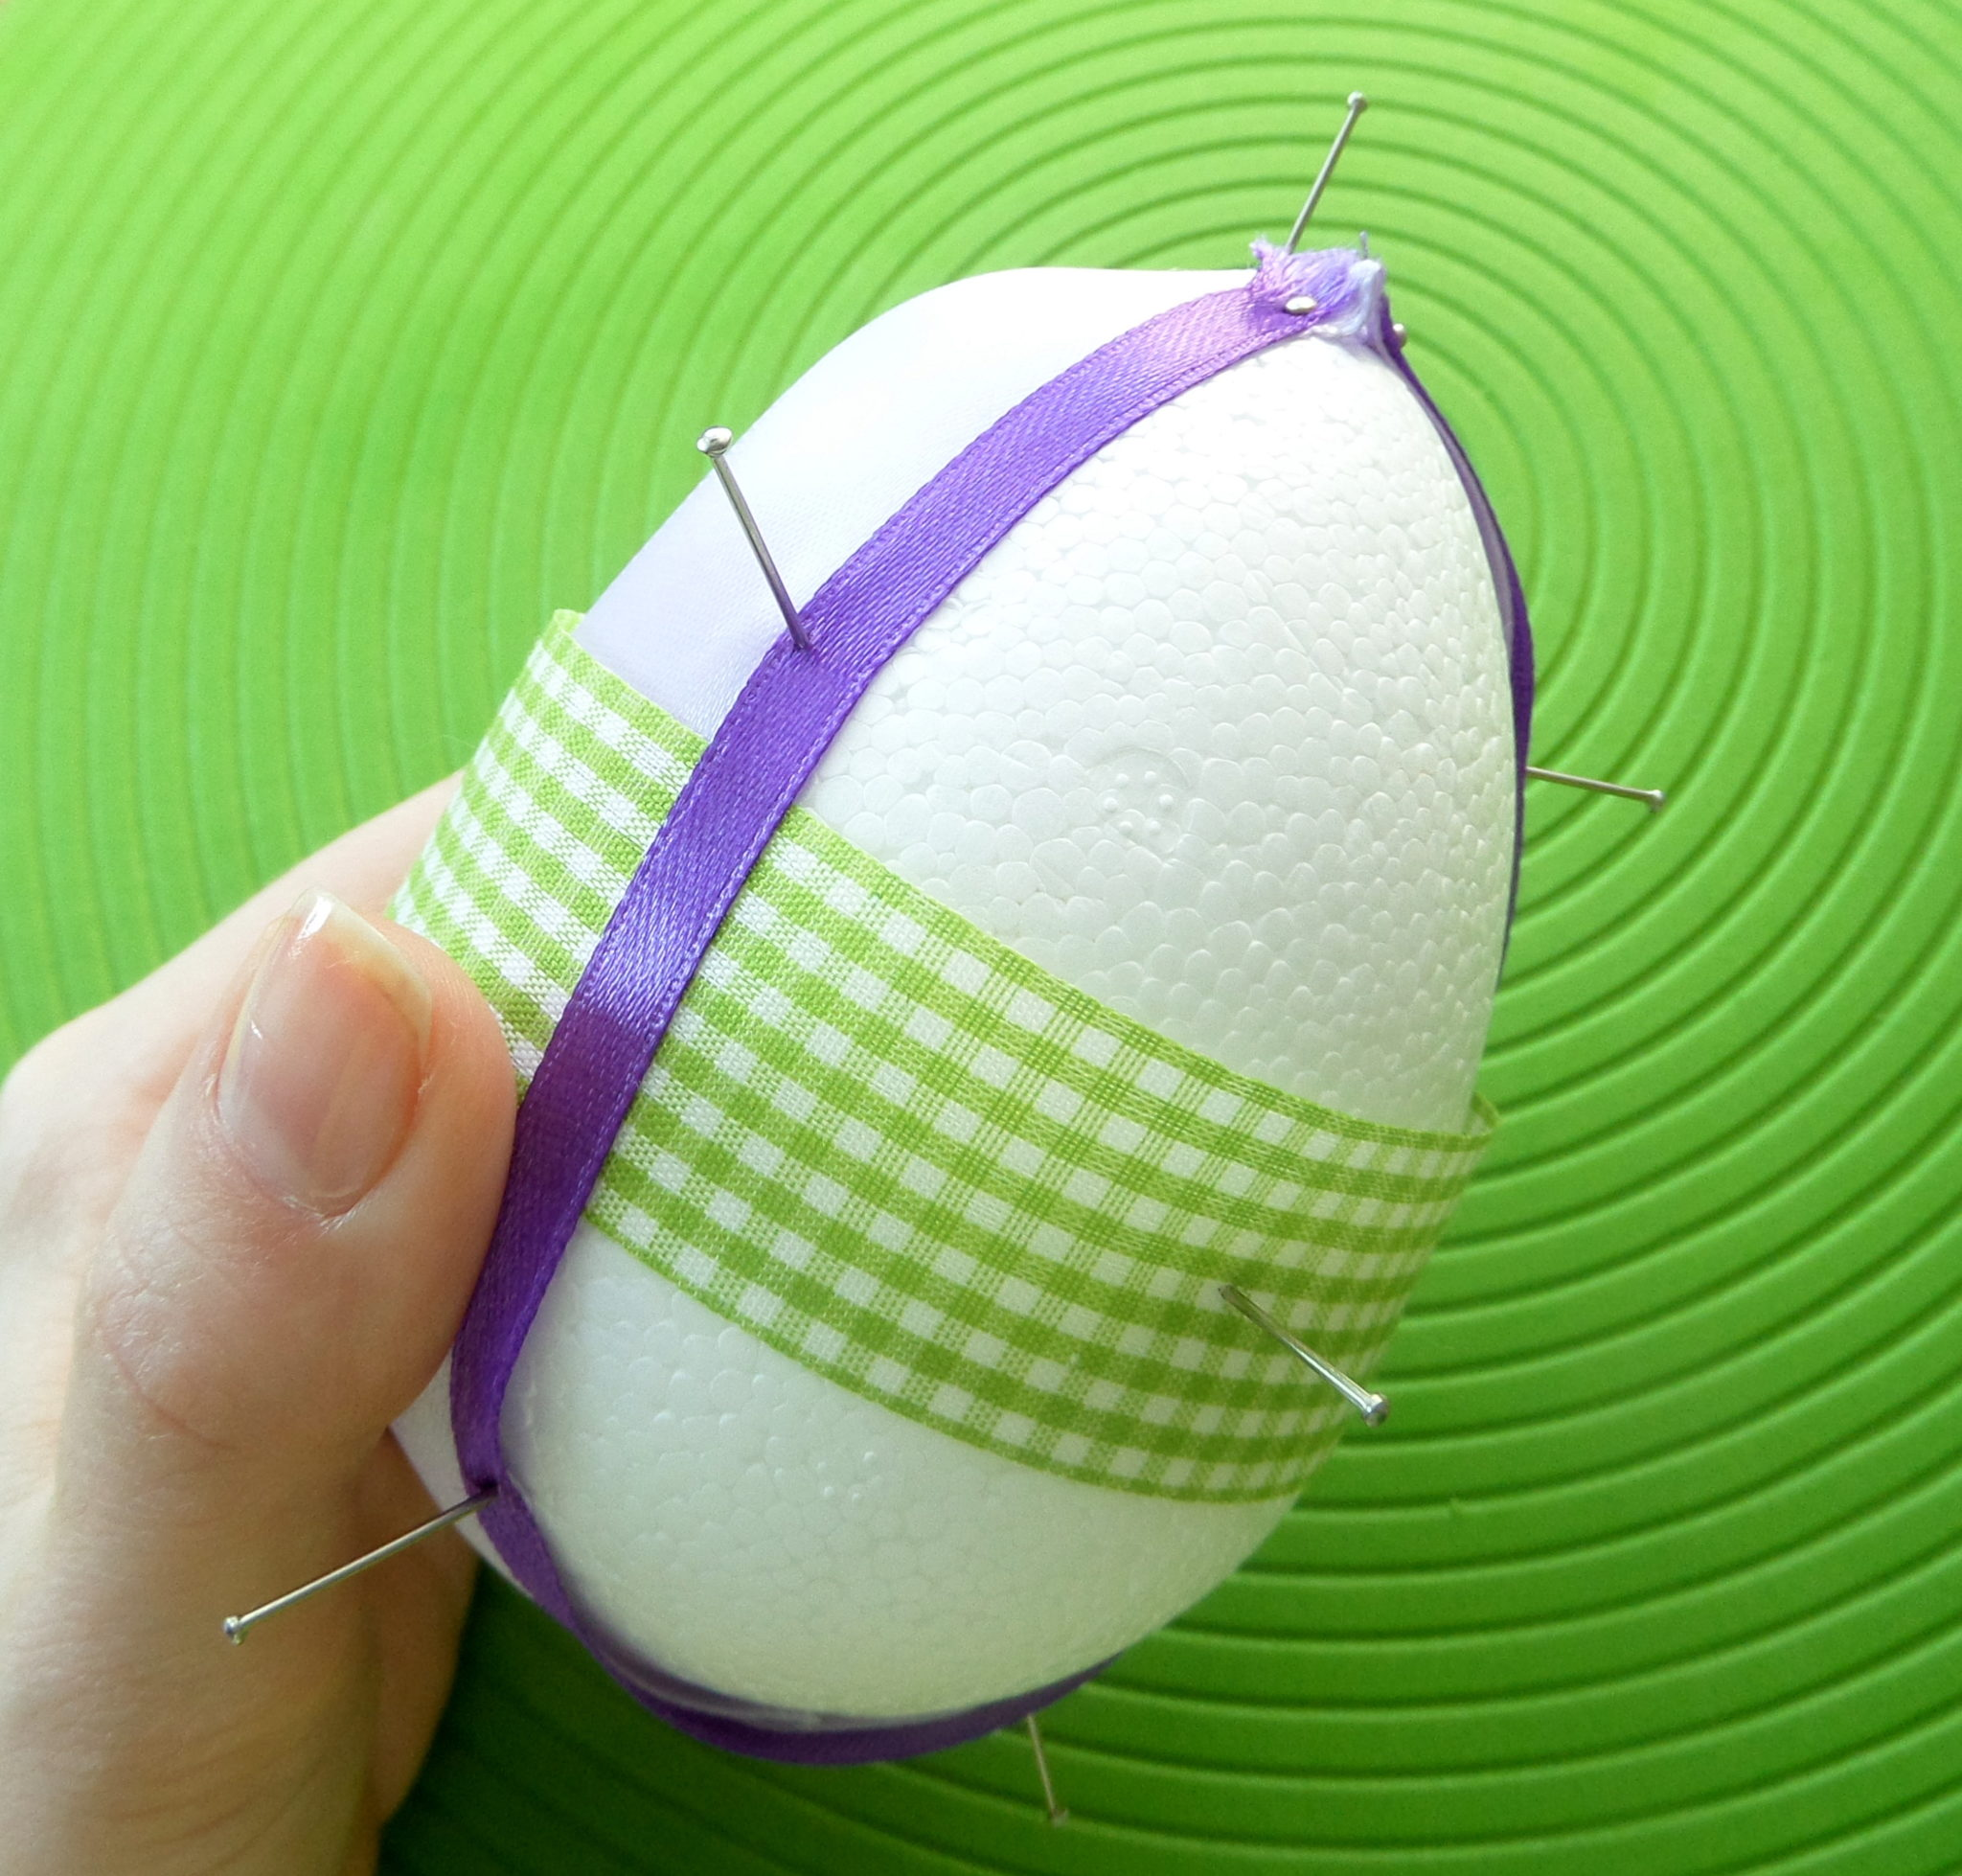 171 - Jajka styropianowe na Wielkanoc